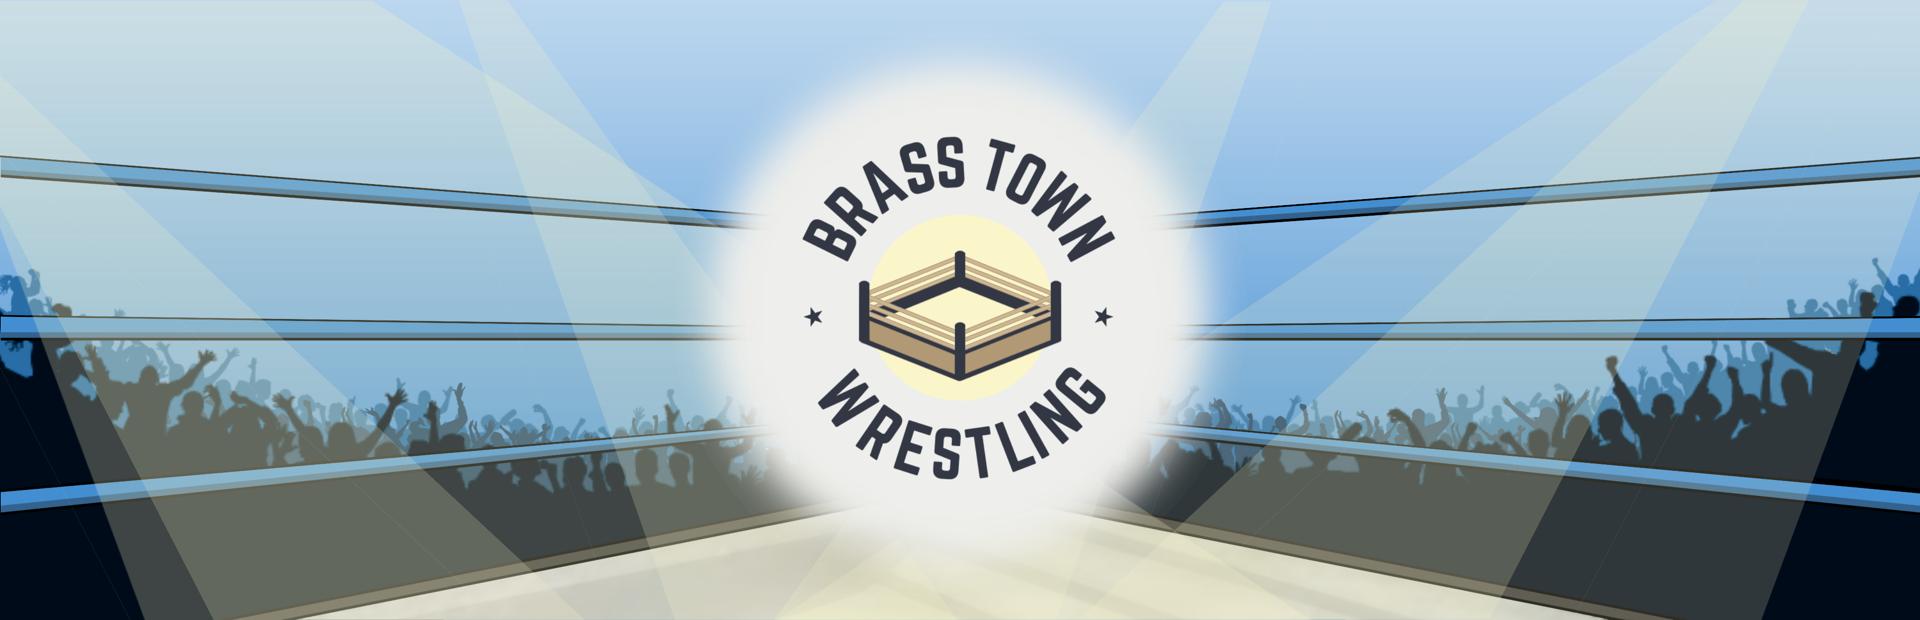 Brass Town Wrestling